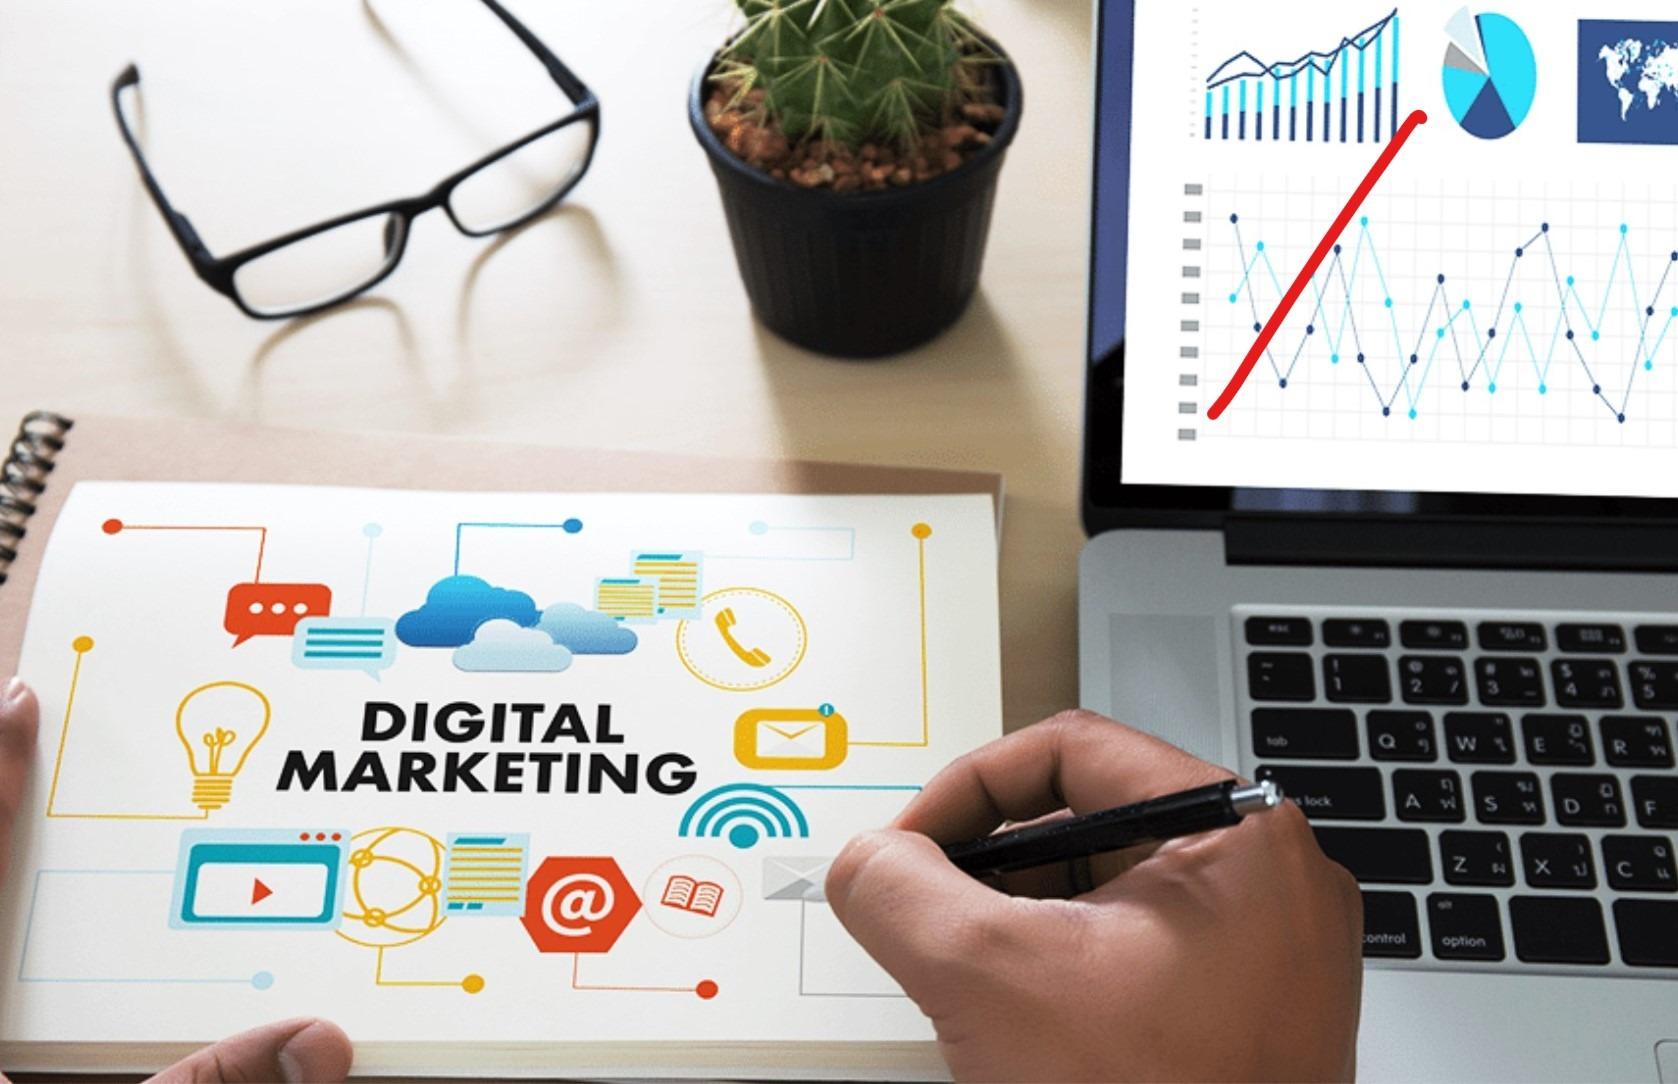 Digital marketing rules